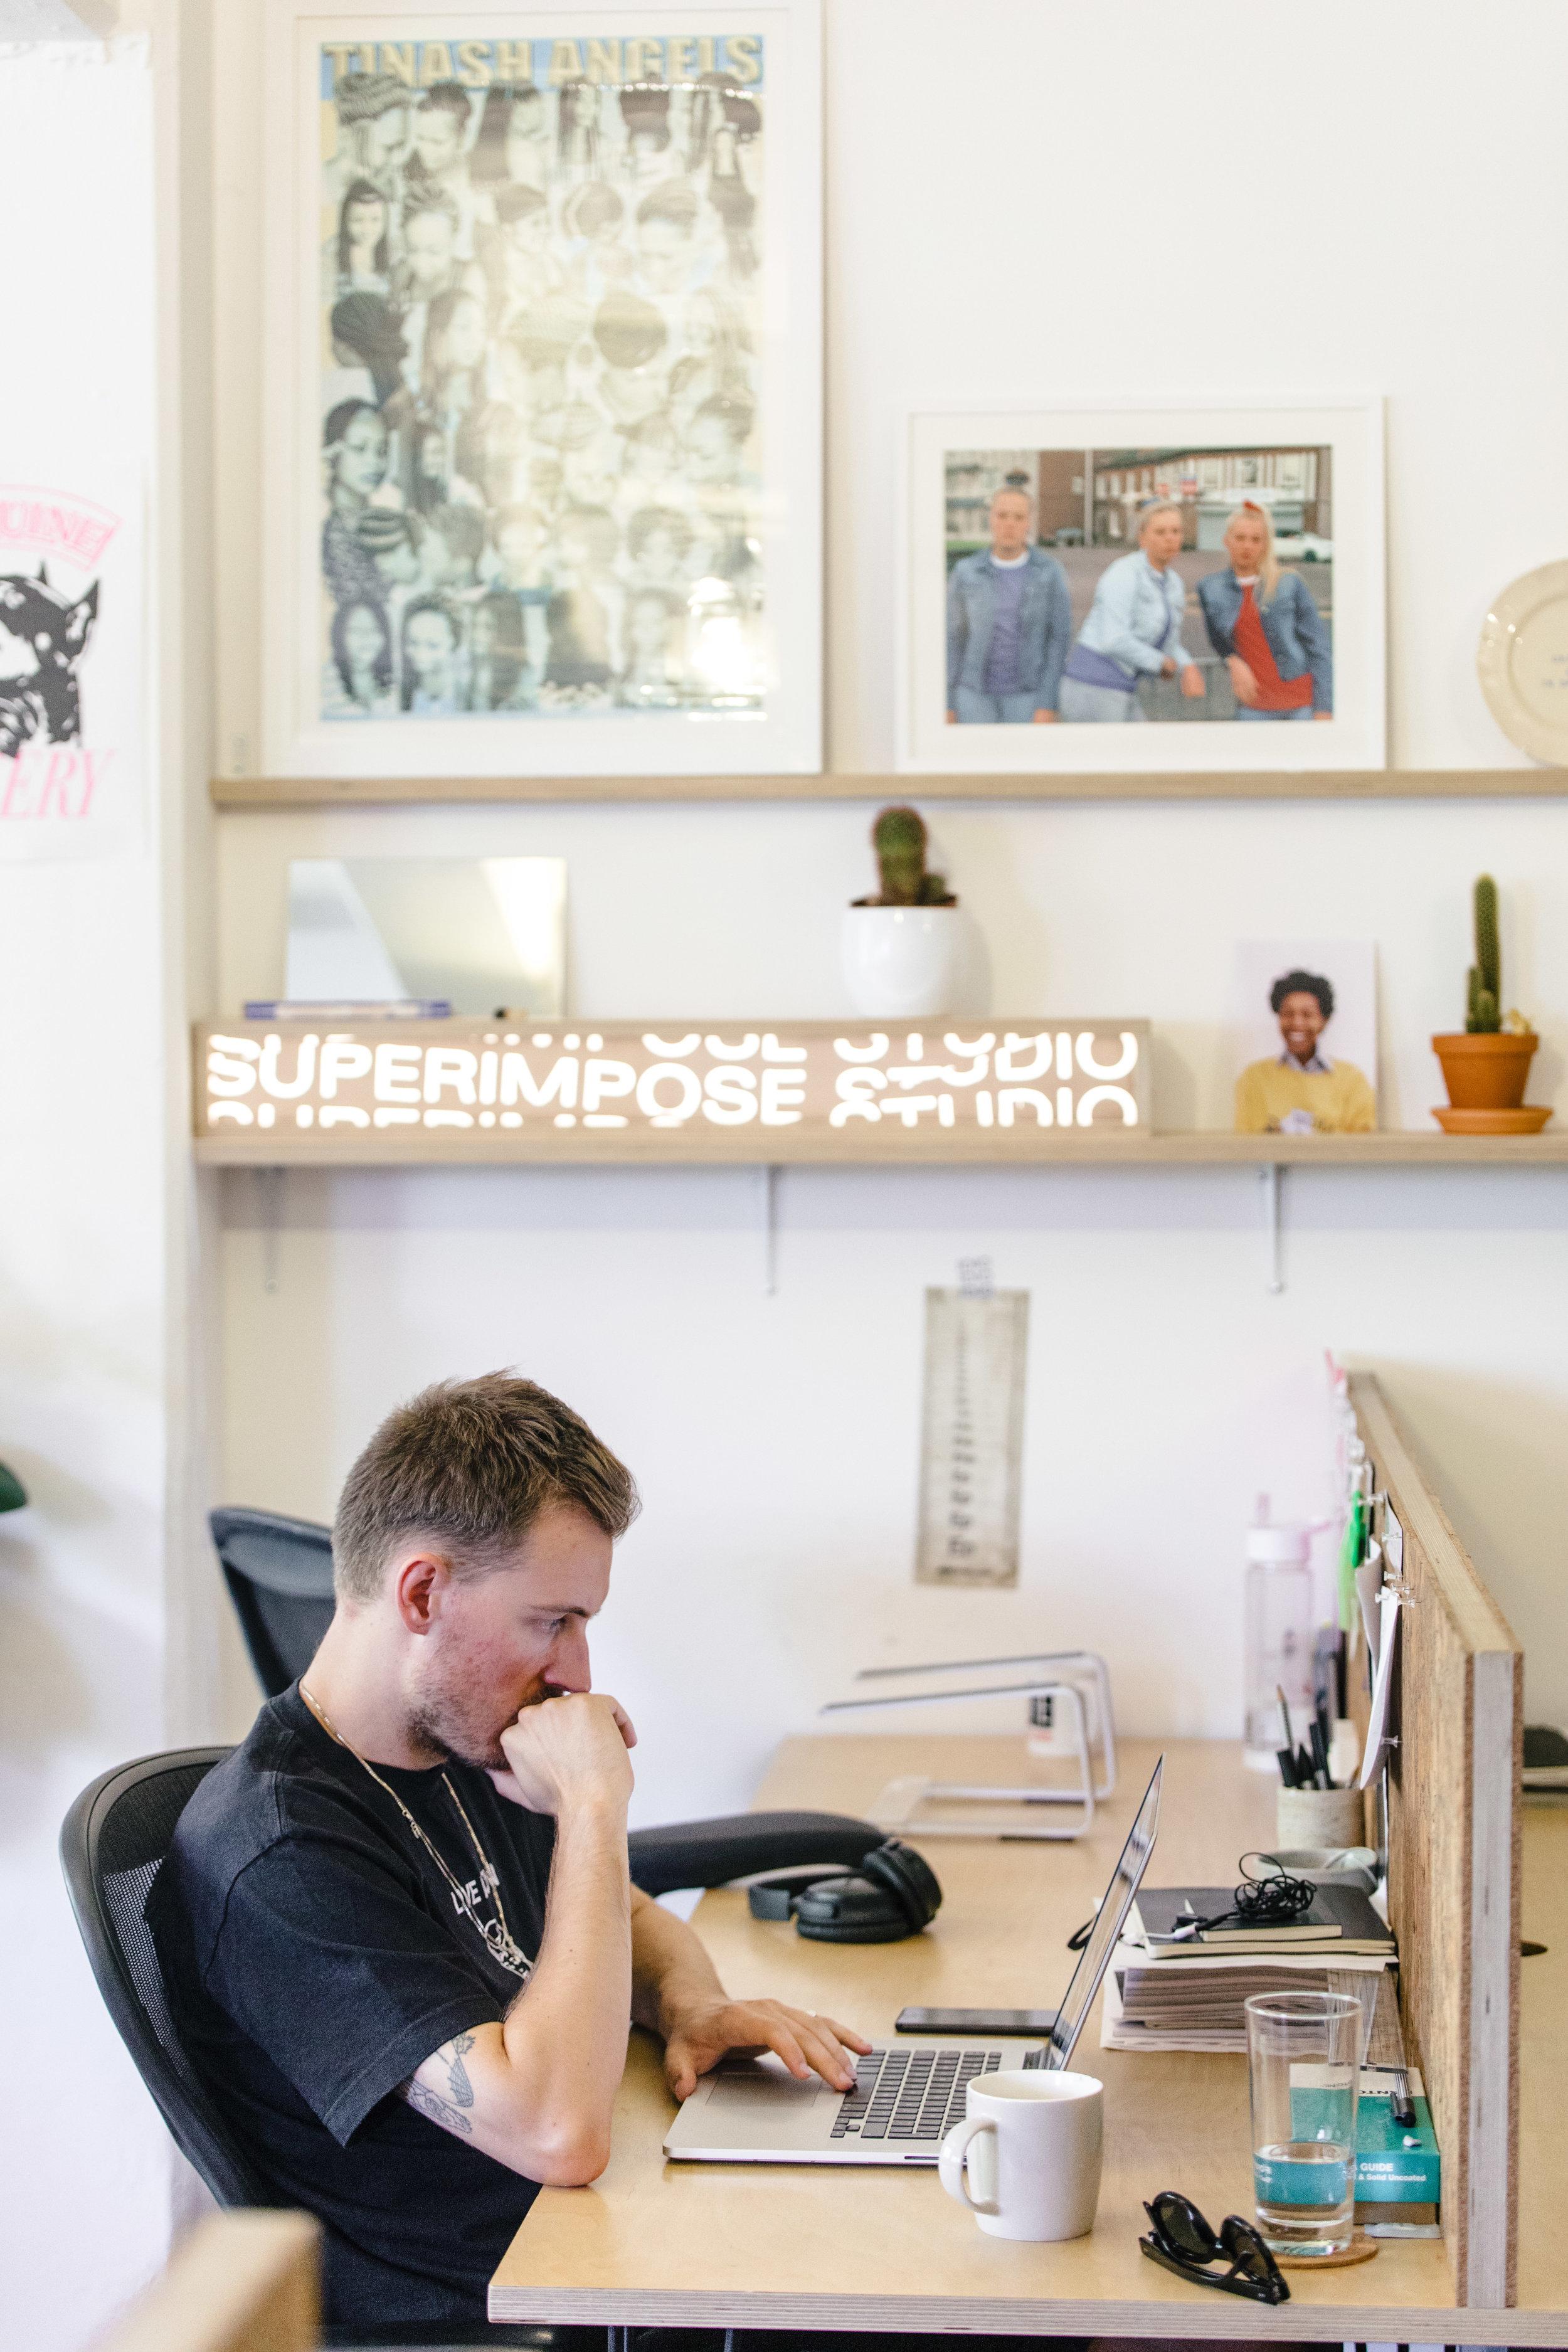 Superimpose |  High Snobiety